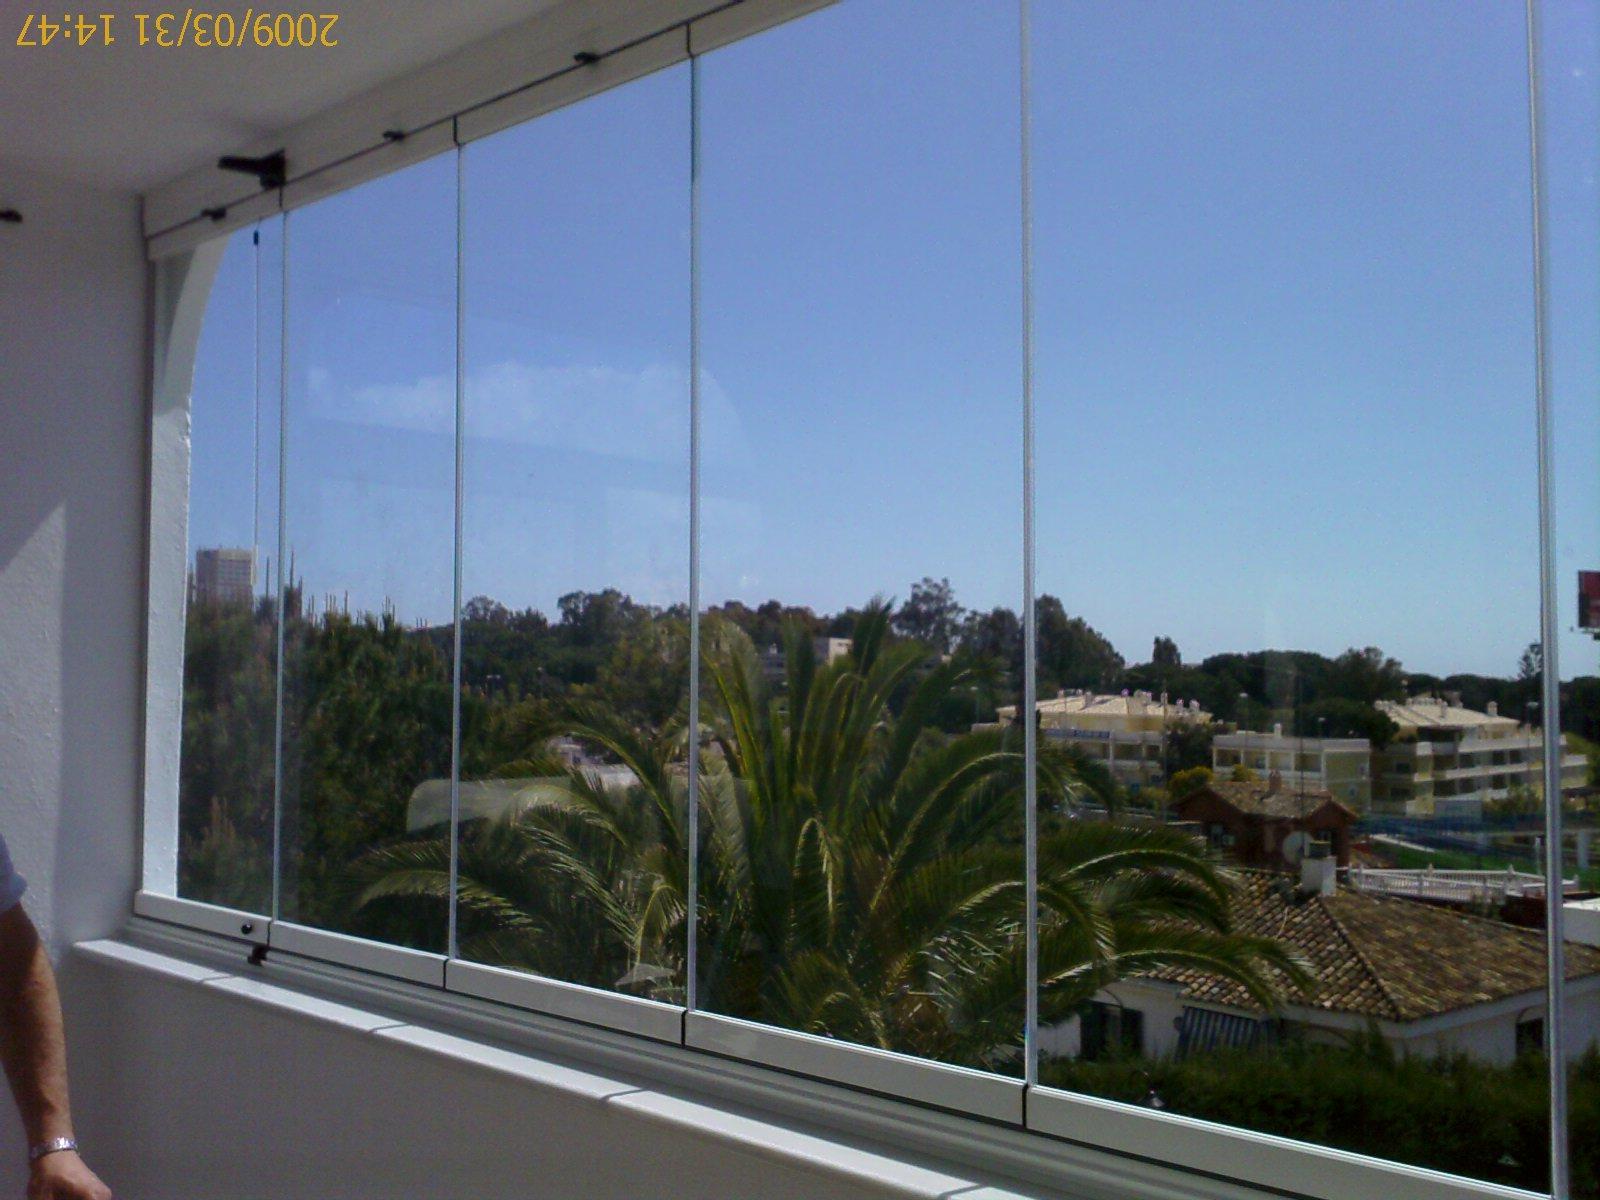 Foto 20 de Carpintería de aluminio, metálica y PVC en Málaga | Aluminios Alunoe